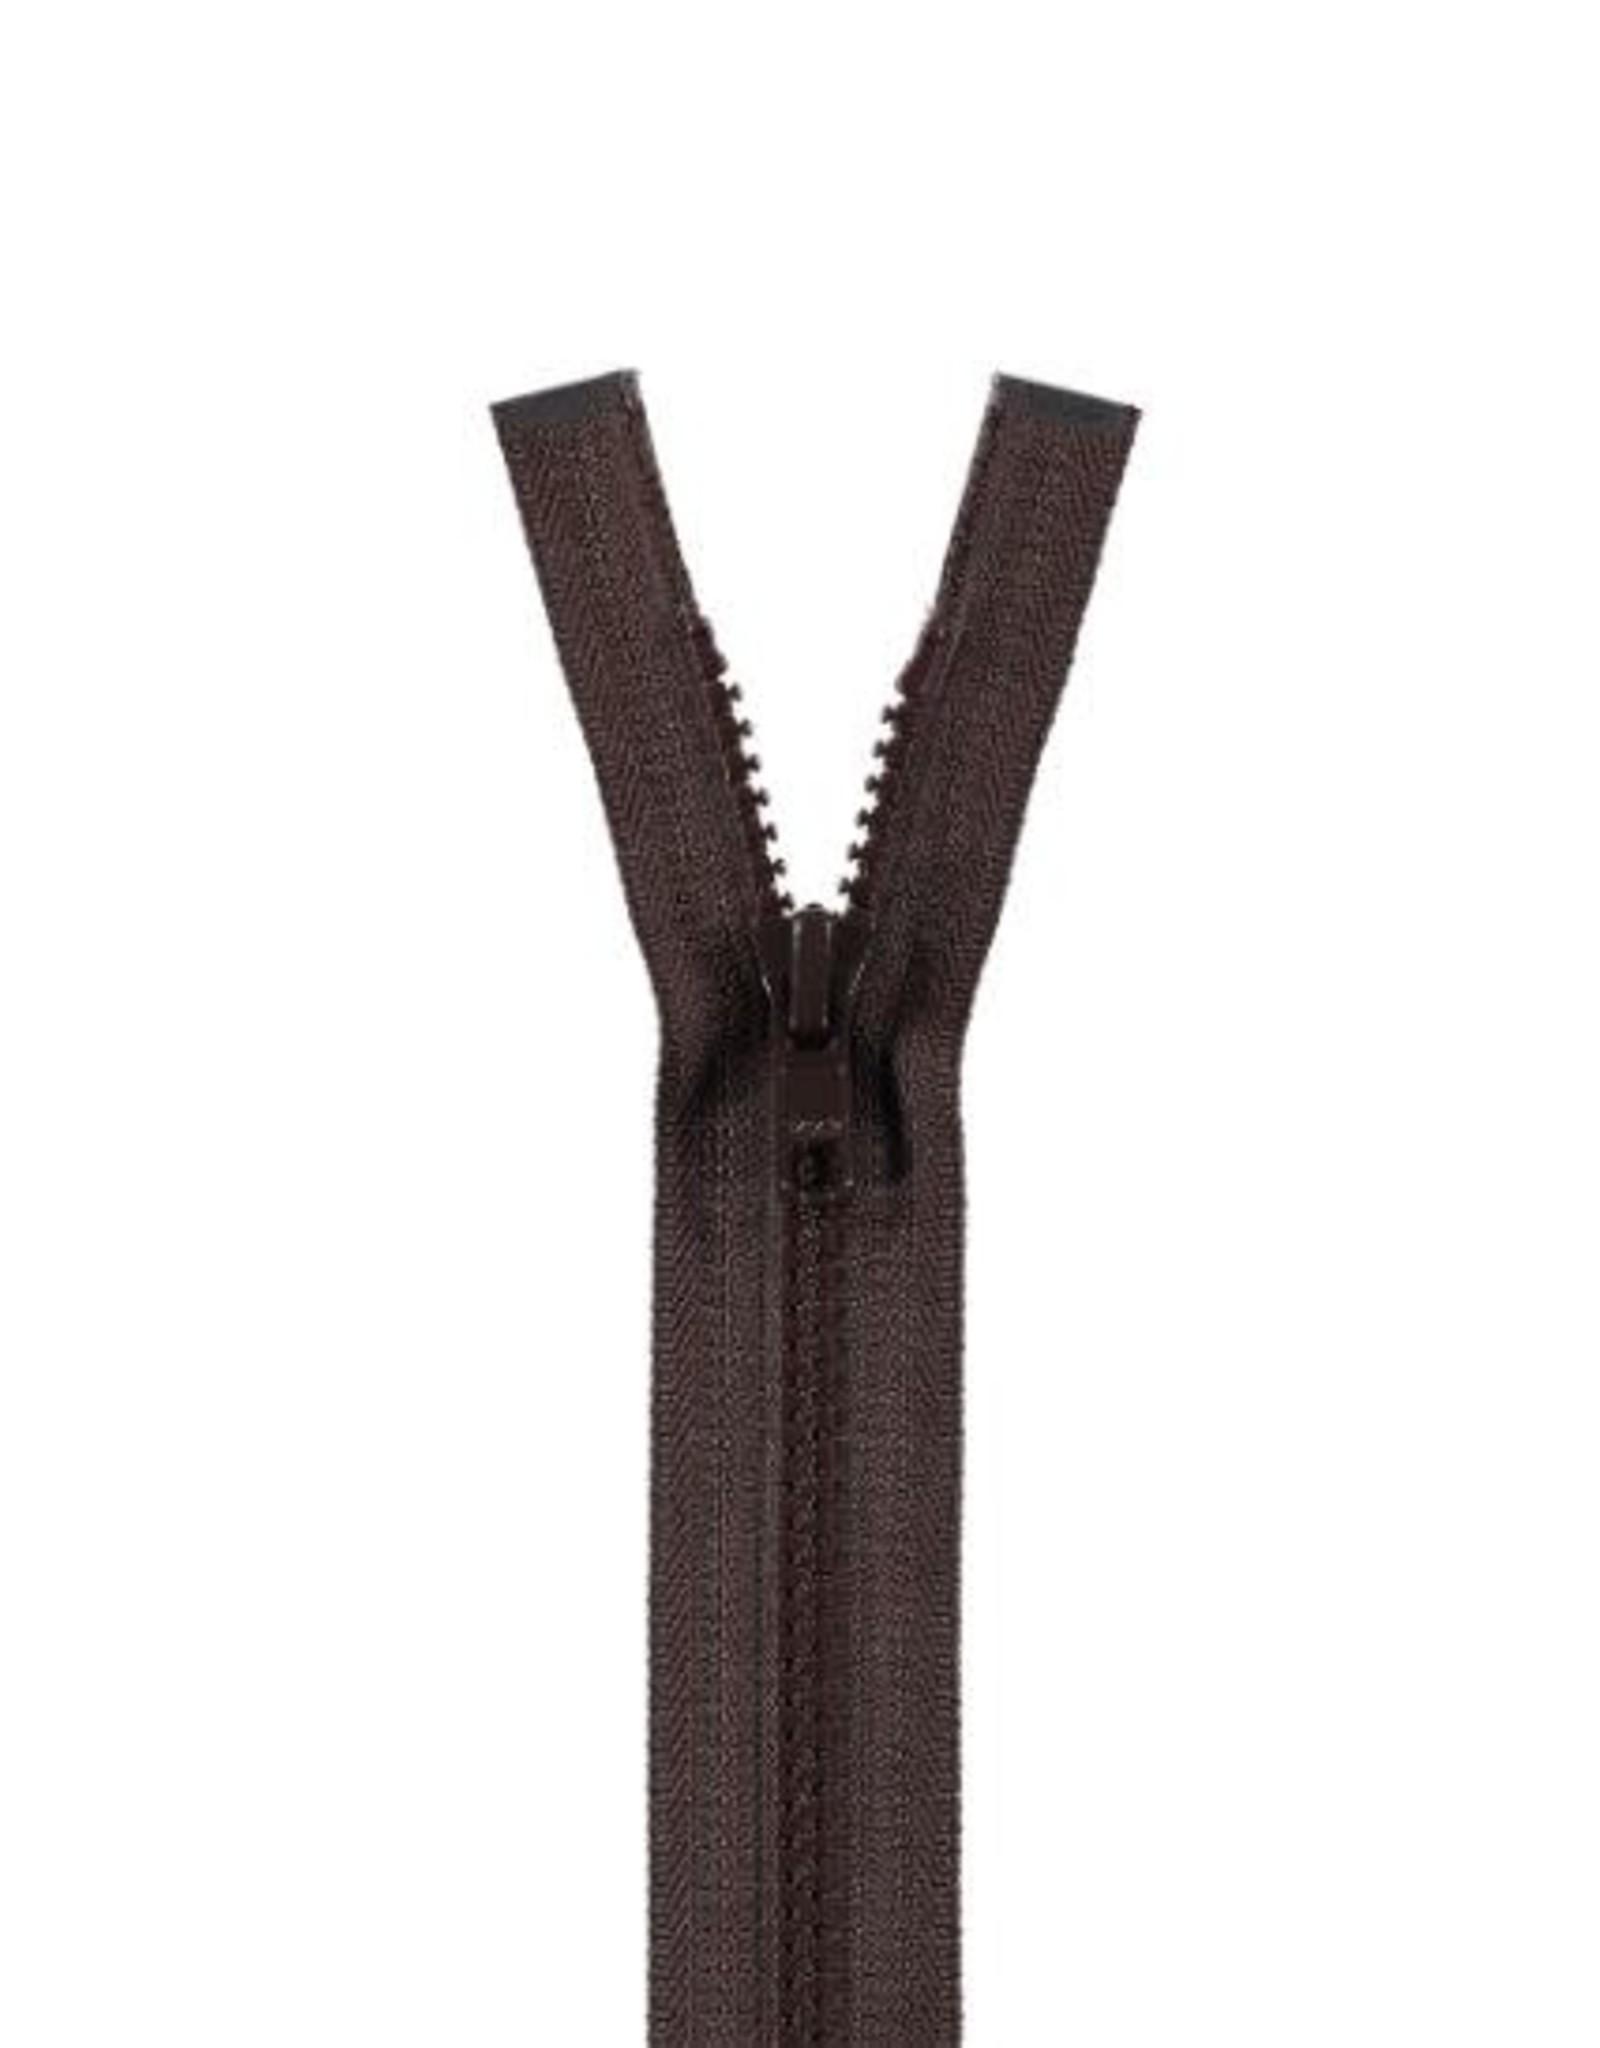 YKK BLOKRITS 5 DEELBAAR bruin 570-70cm